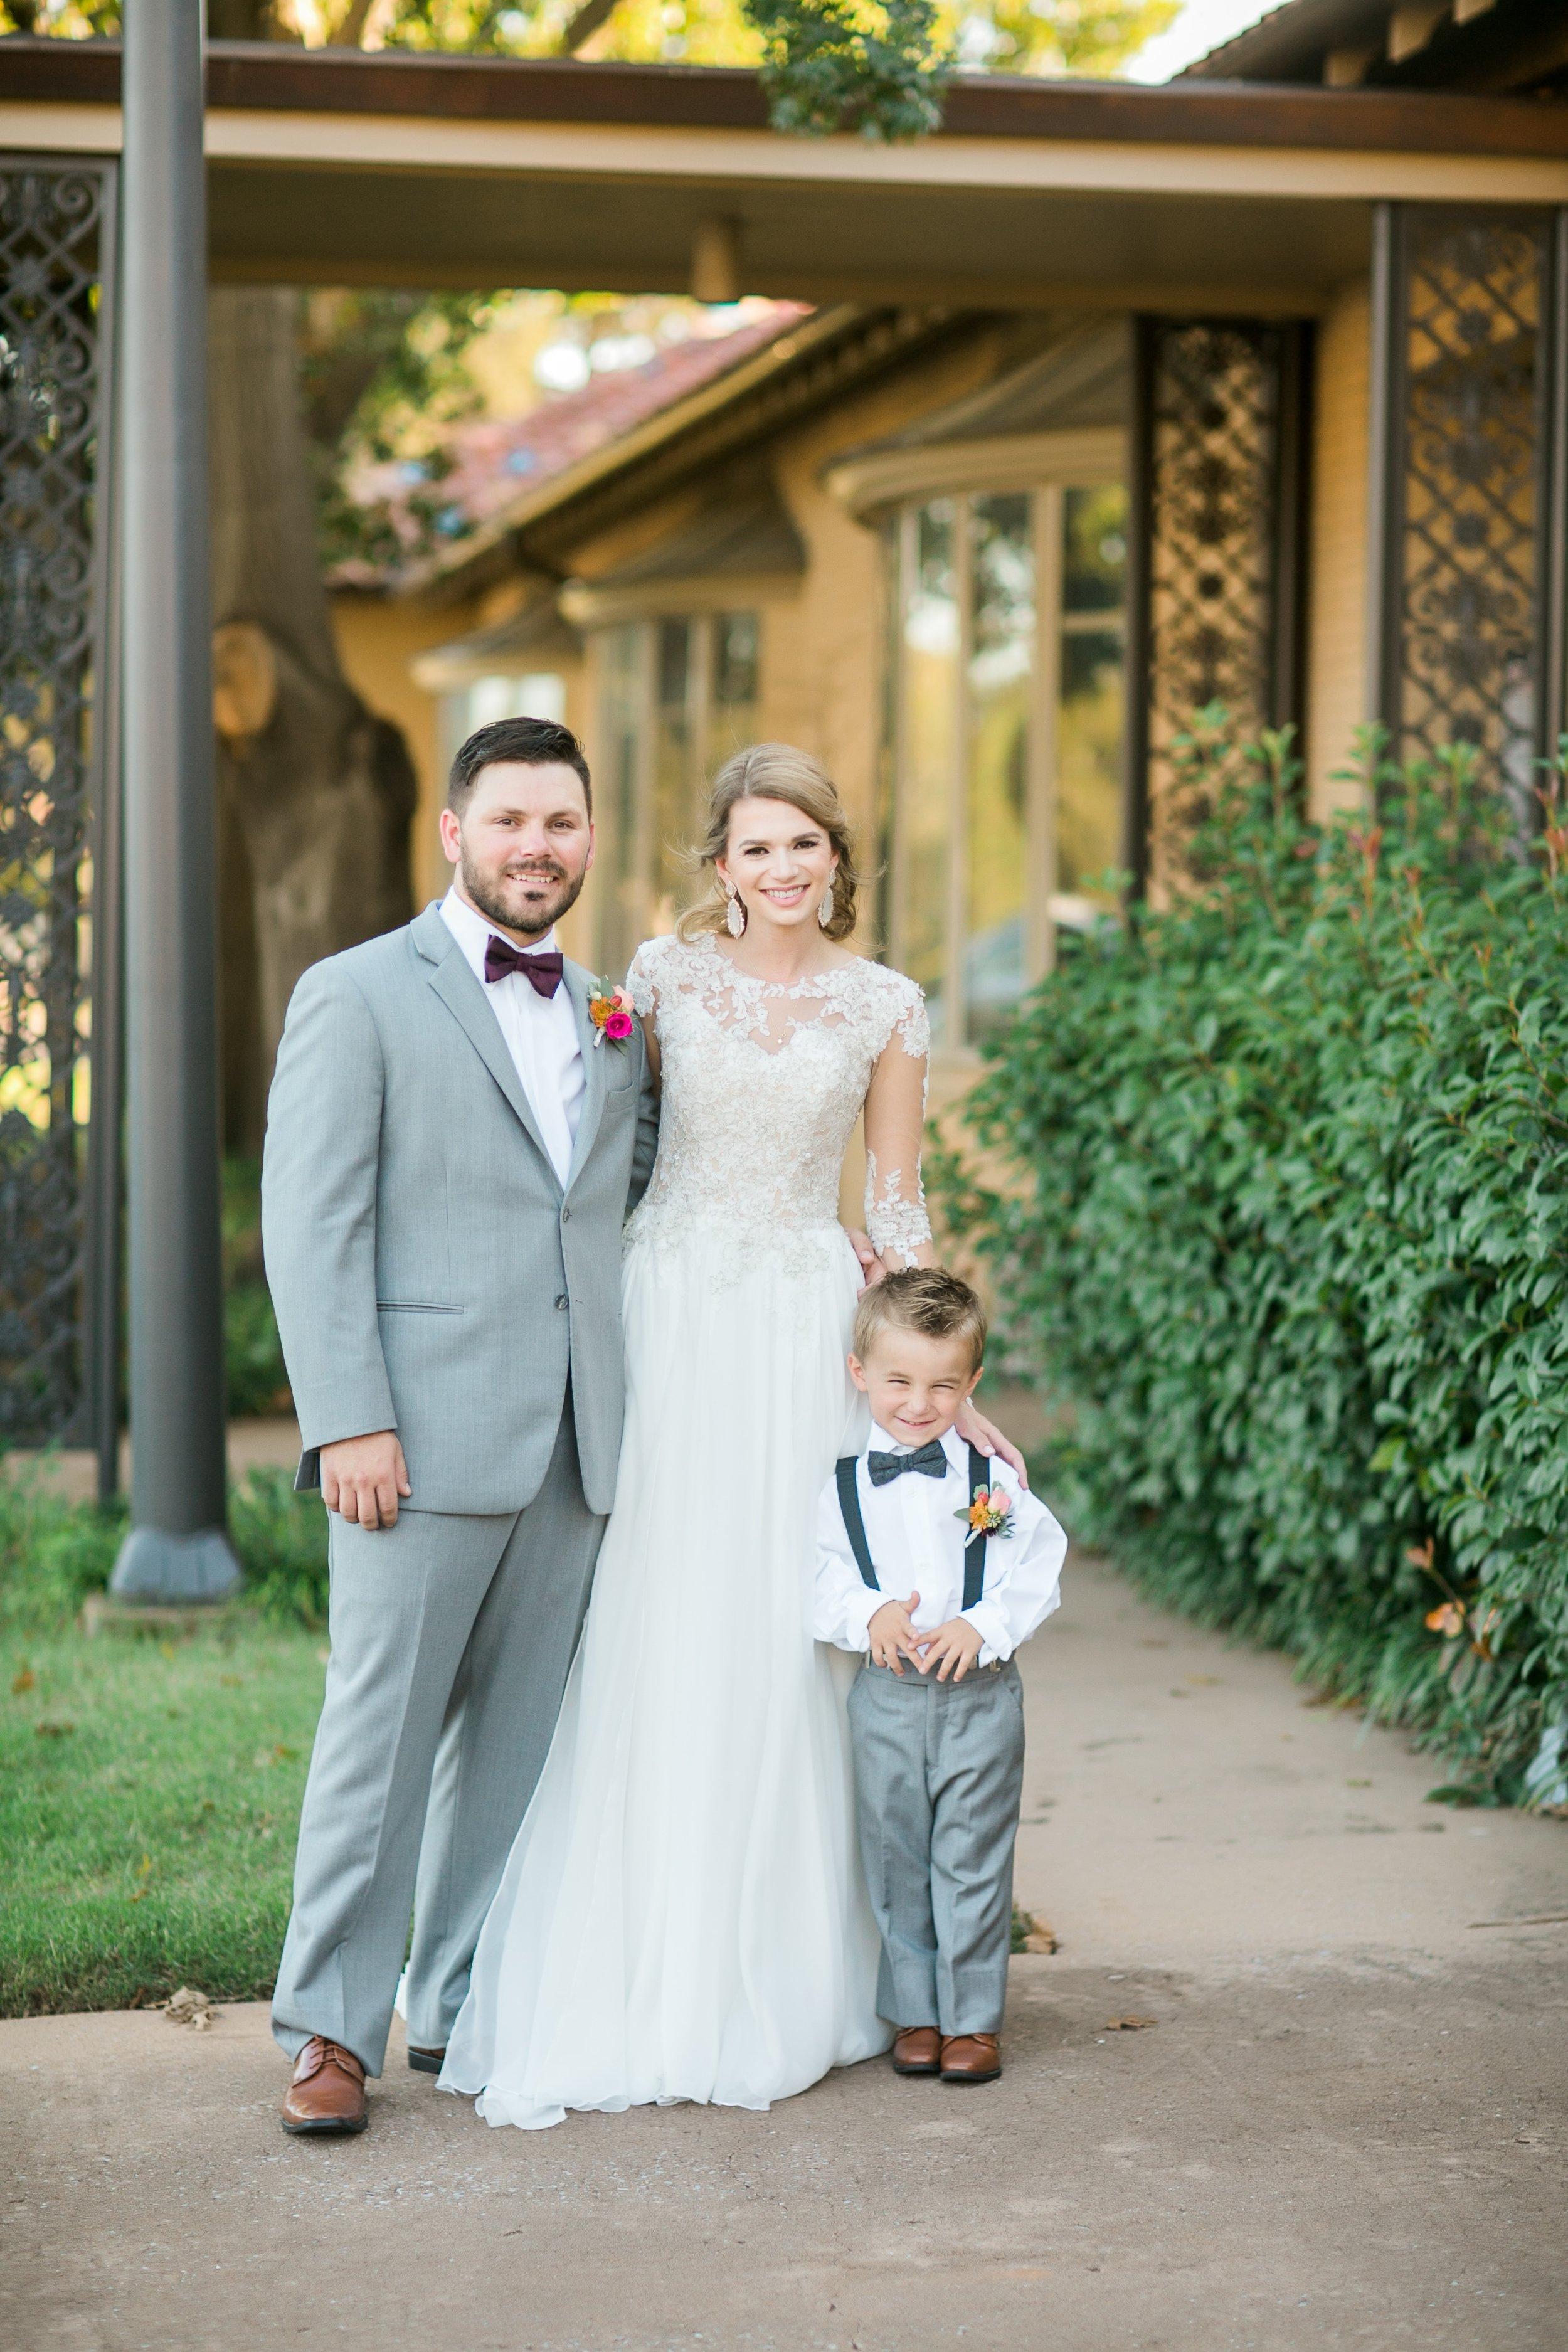 Roberson-Wedding-The-Forum-Lauren-Pinson-Wedding-Photography-Wichita-Falls-Texas-069.jpg